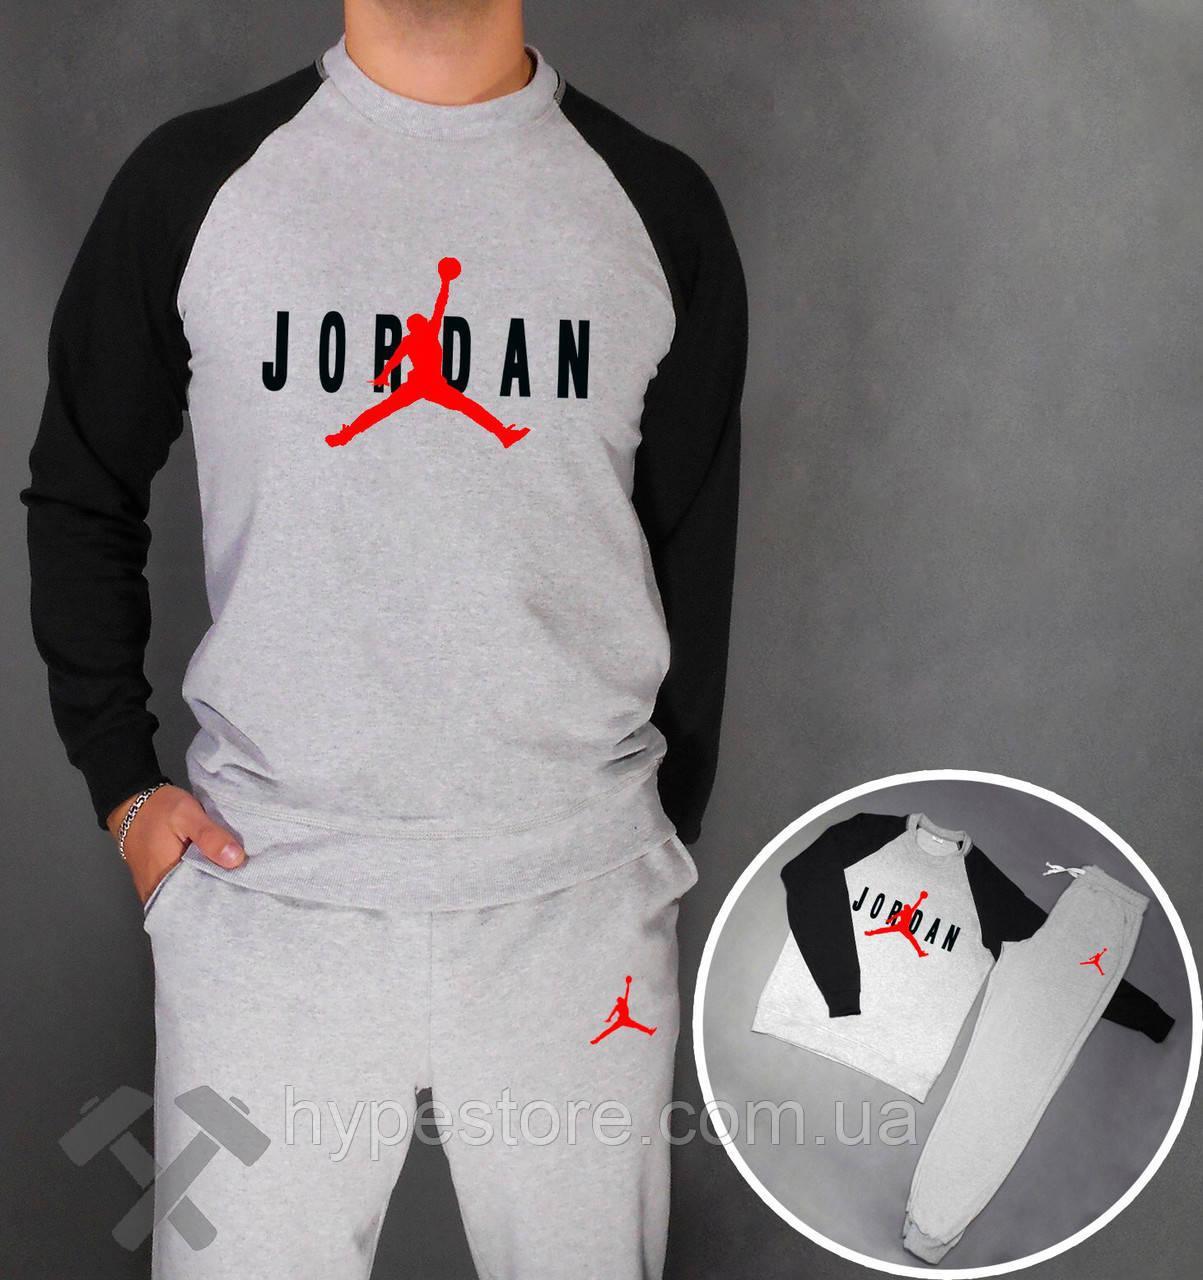 Спортивный костюм, реглан+штаны Jordan, Реплика  продажа, цена в ... 942727210f6